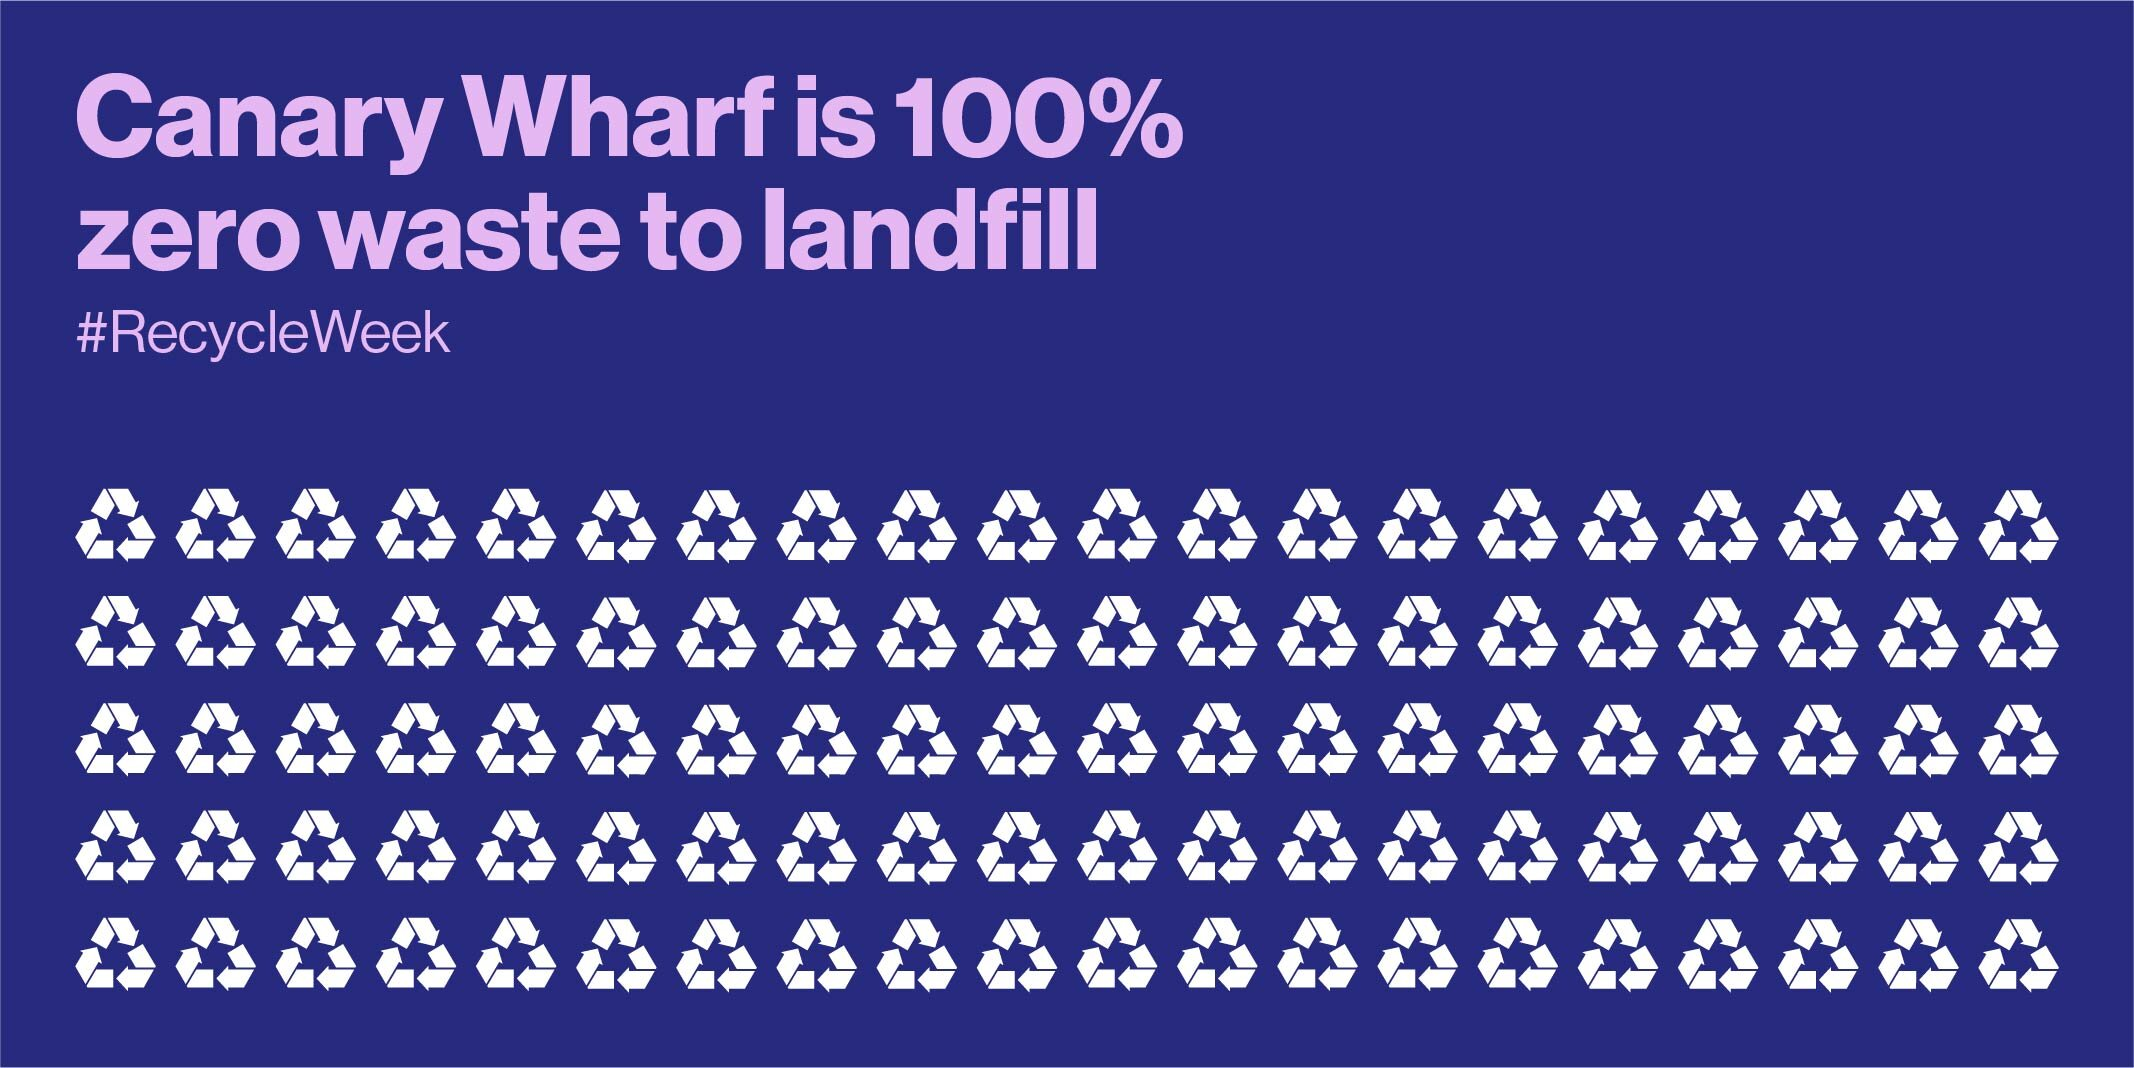 100 zero waste landfill_Twitter 1.jpg